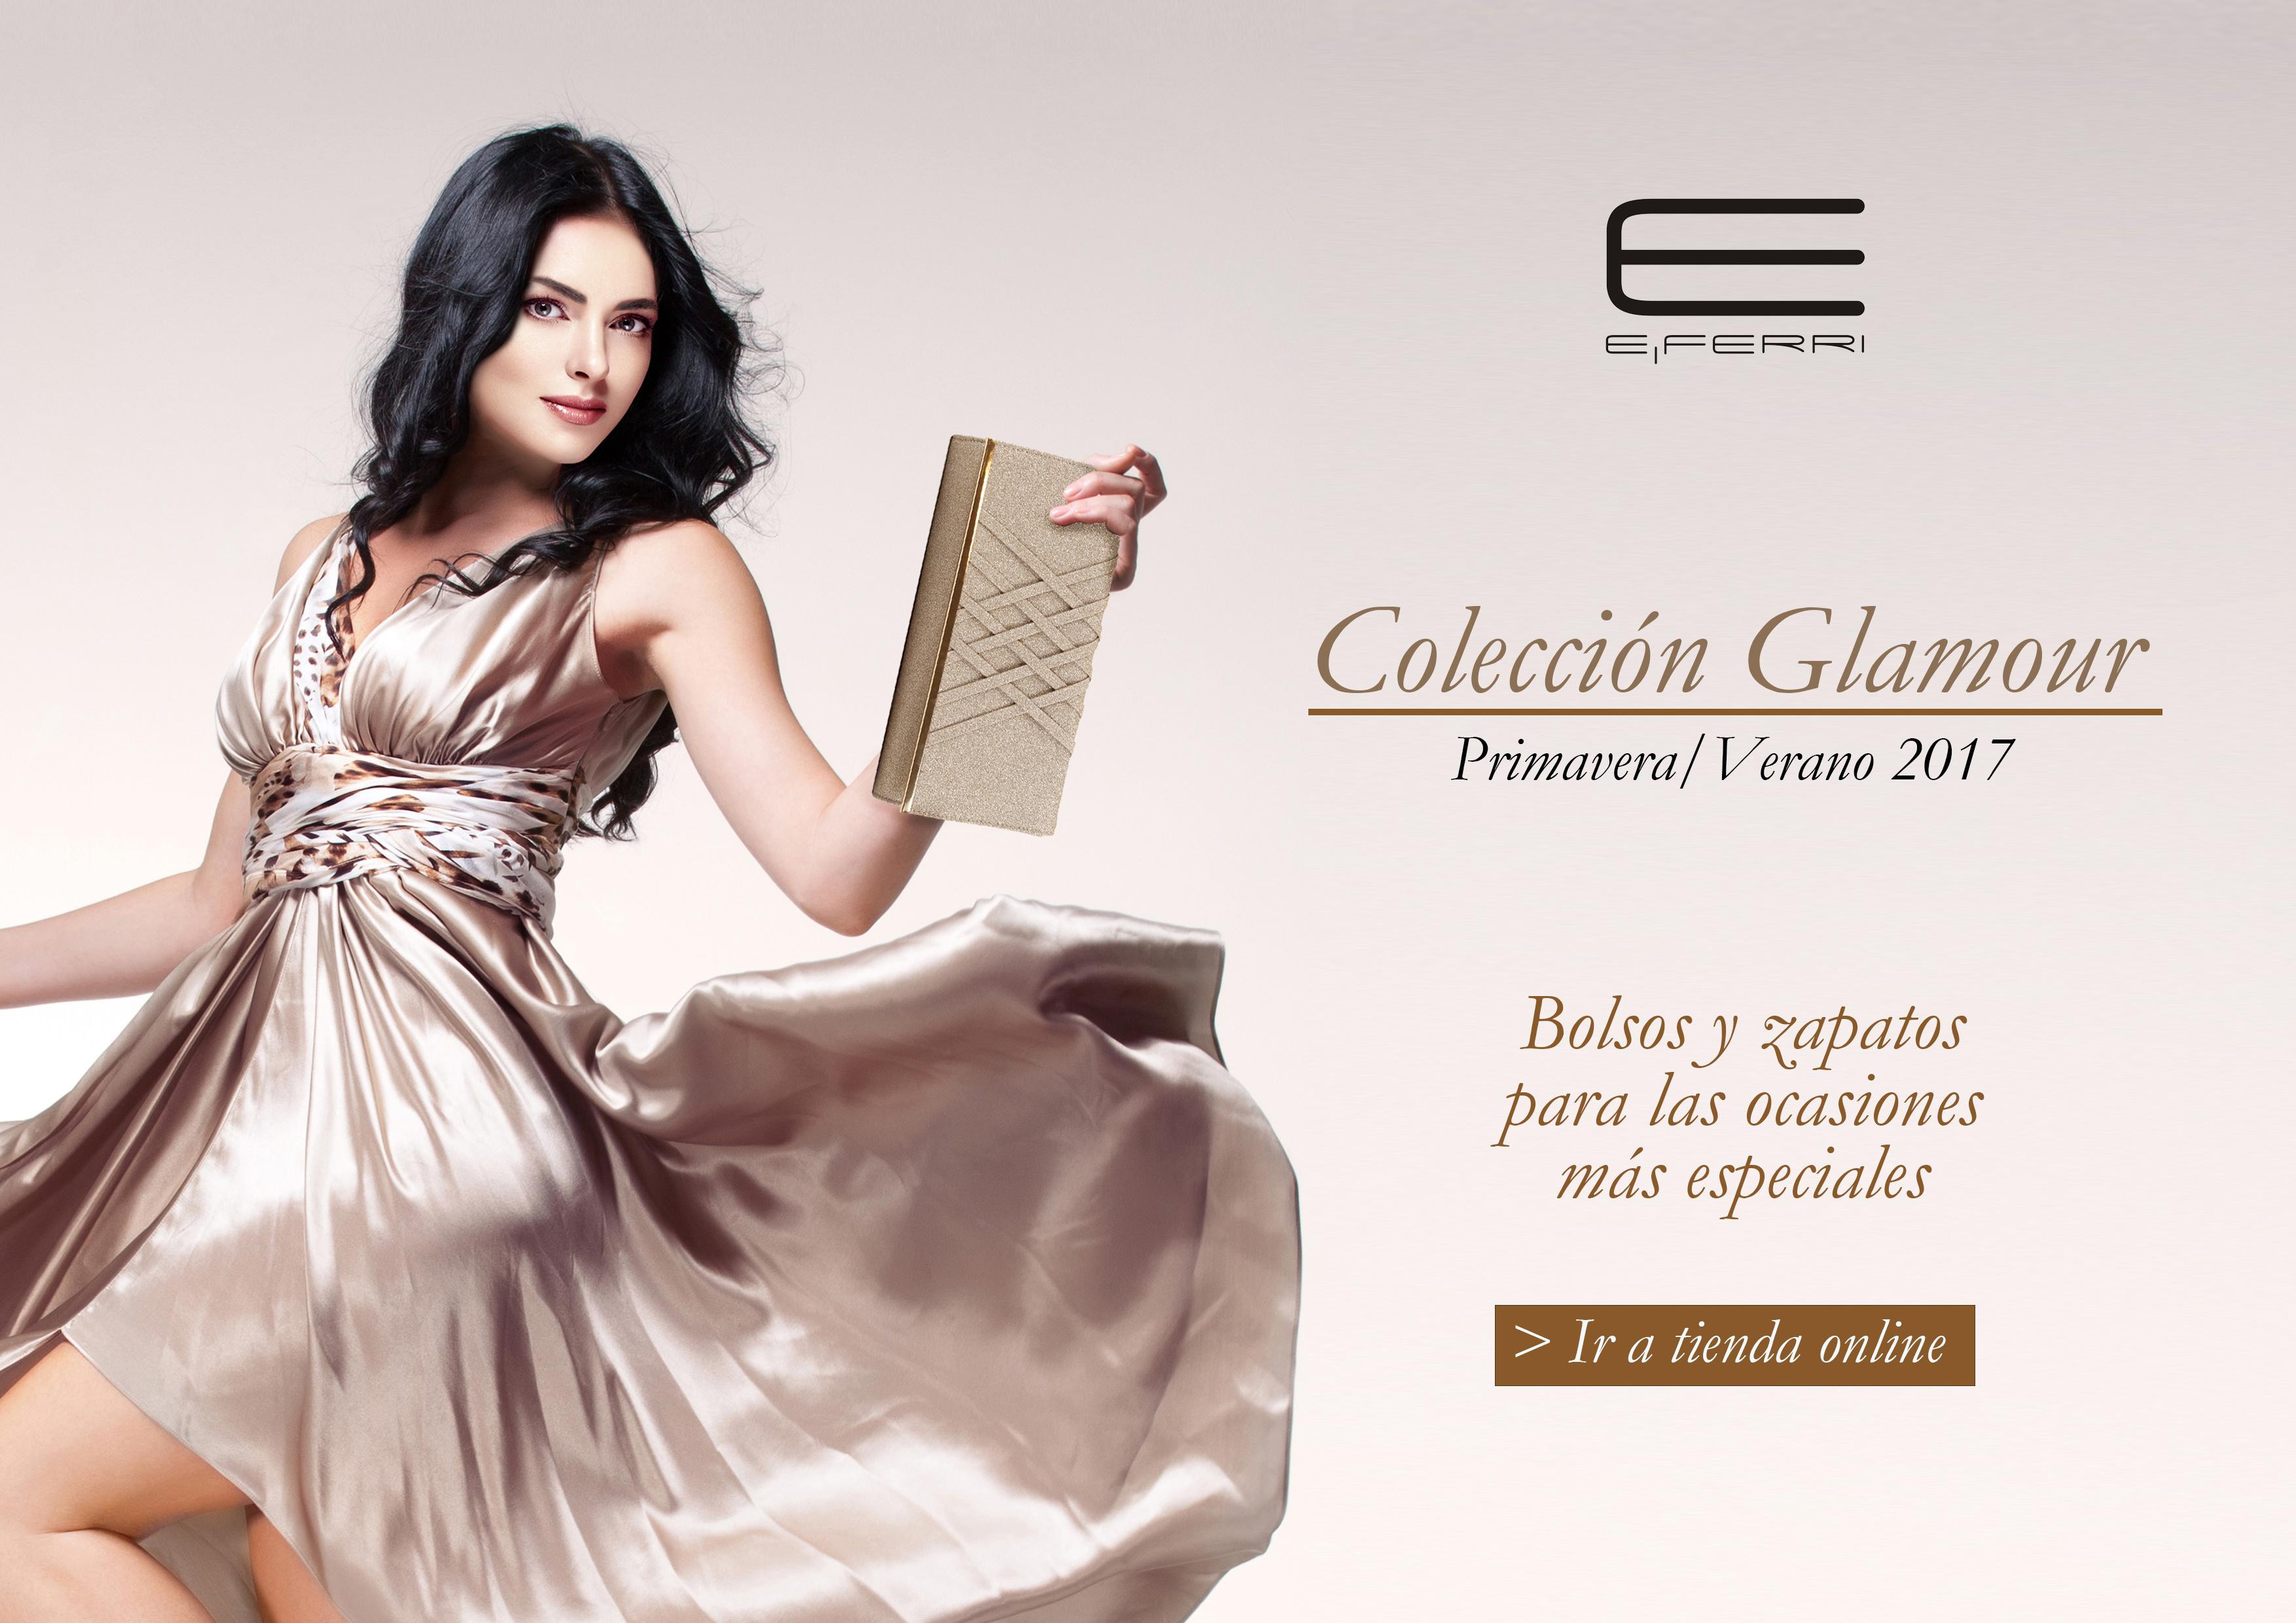 Colección Glamour primavera verano 2017